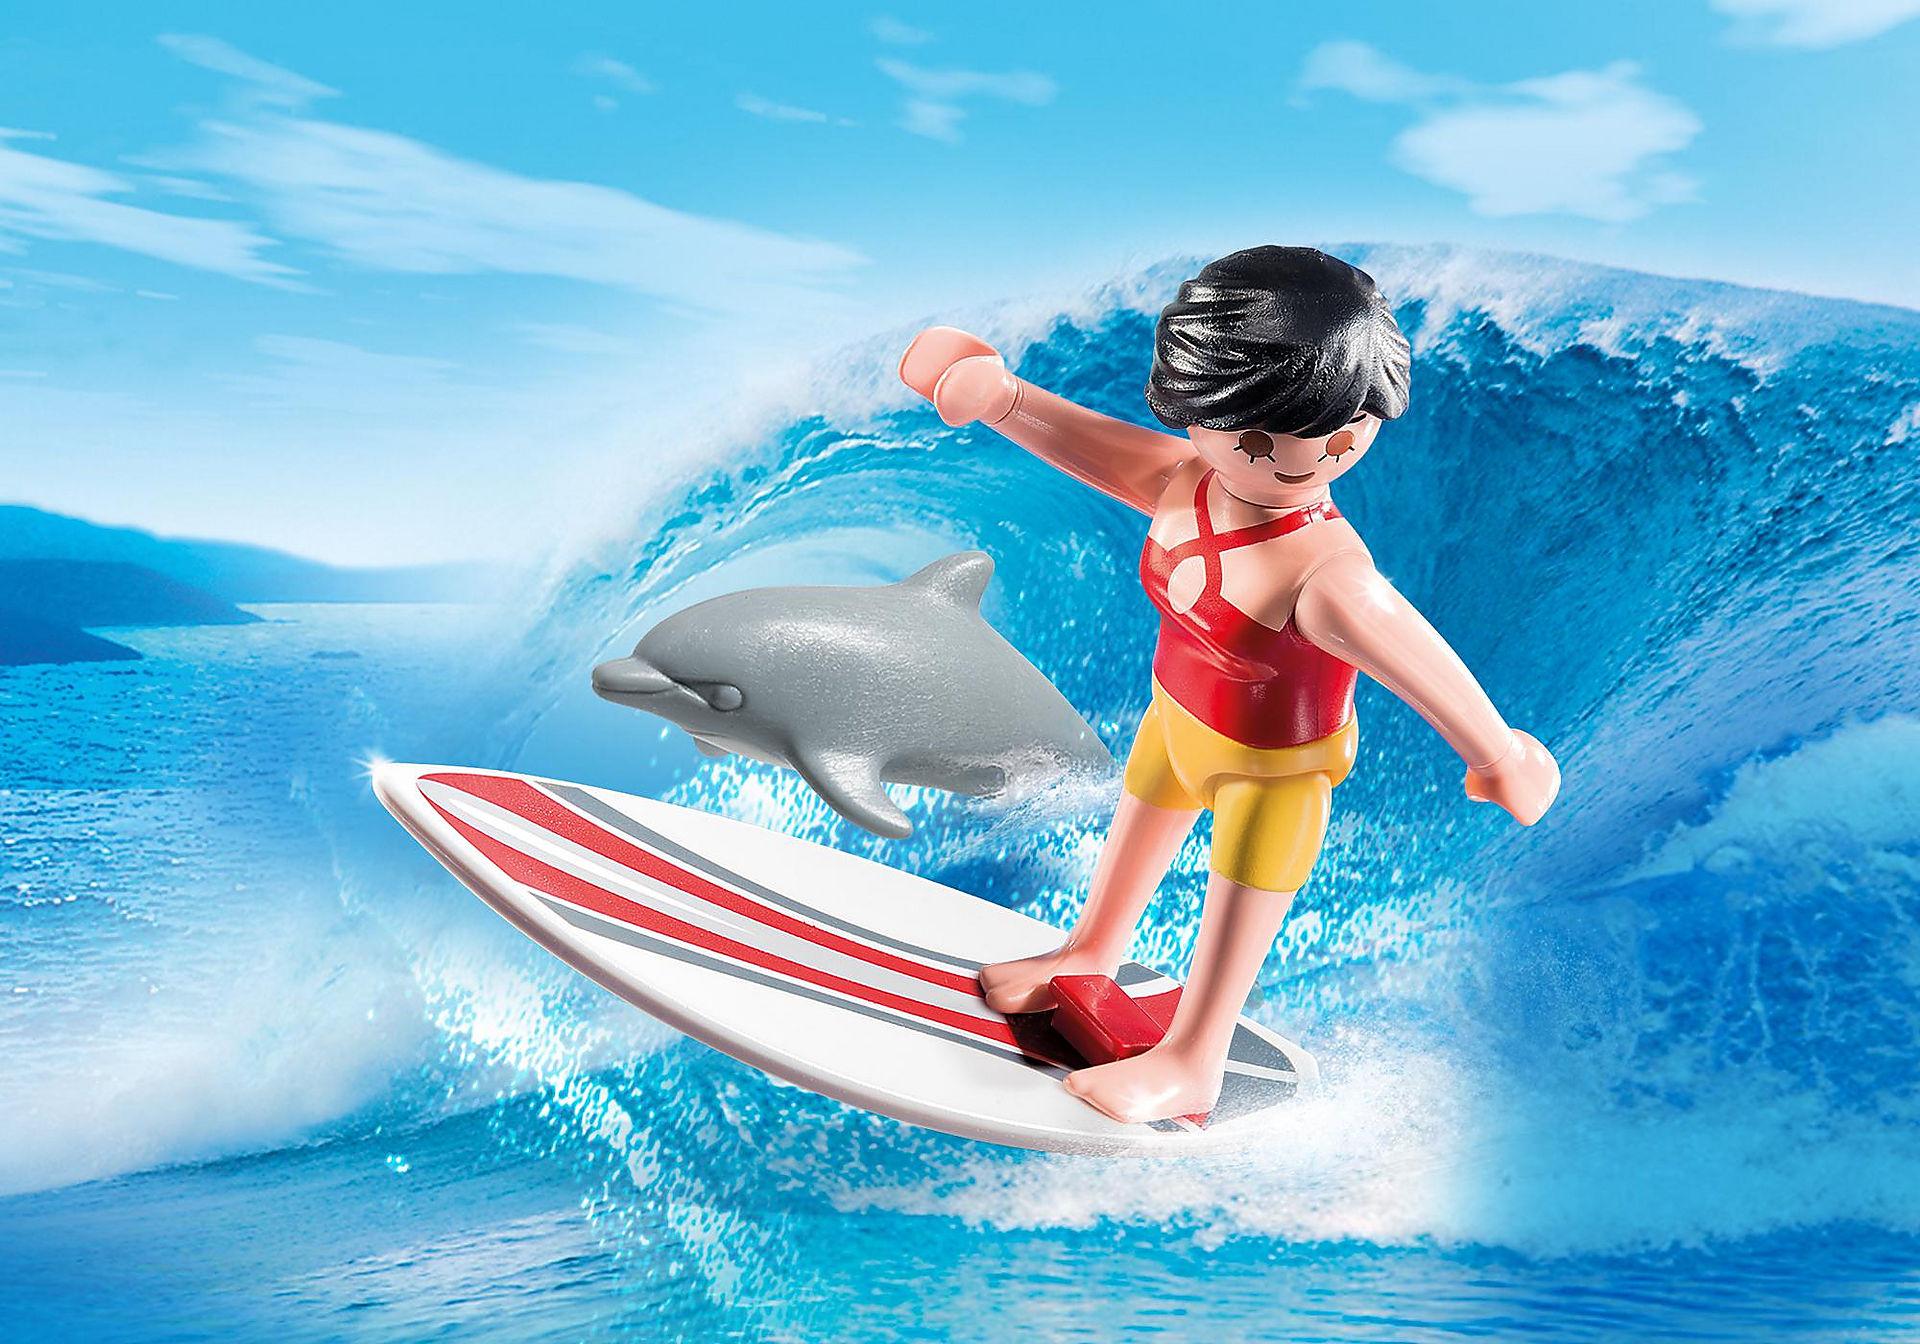 http://media.playmobil.com/i/playmobil/5372_product_detail/Surfista con Tabla de Surf